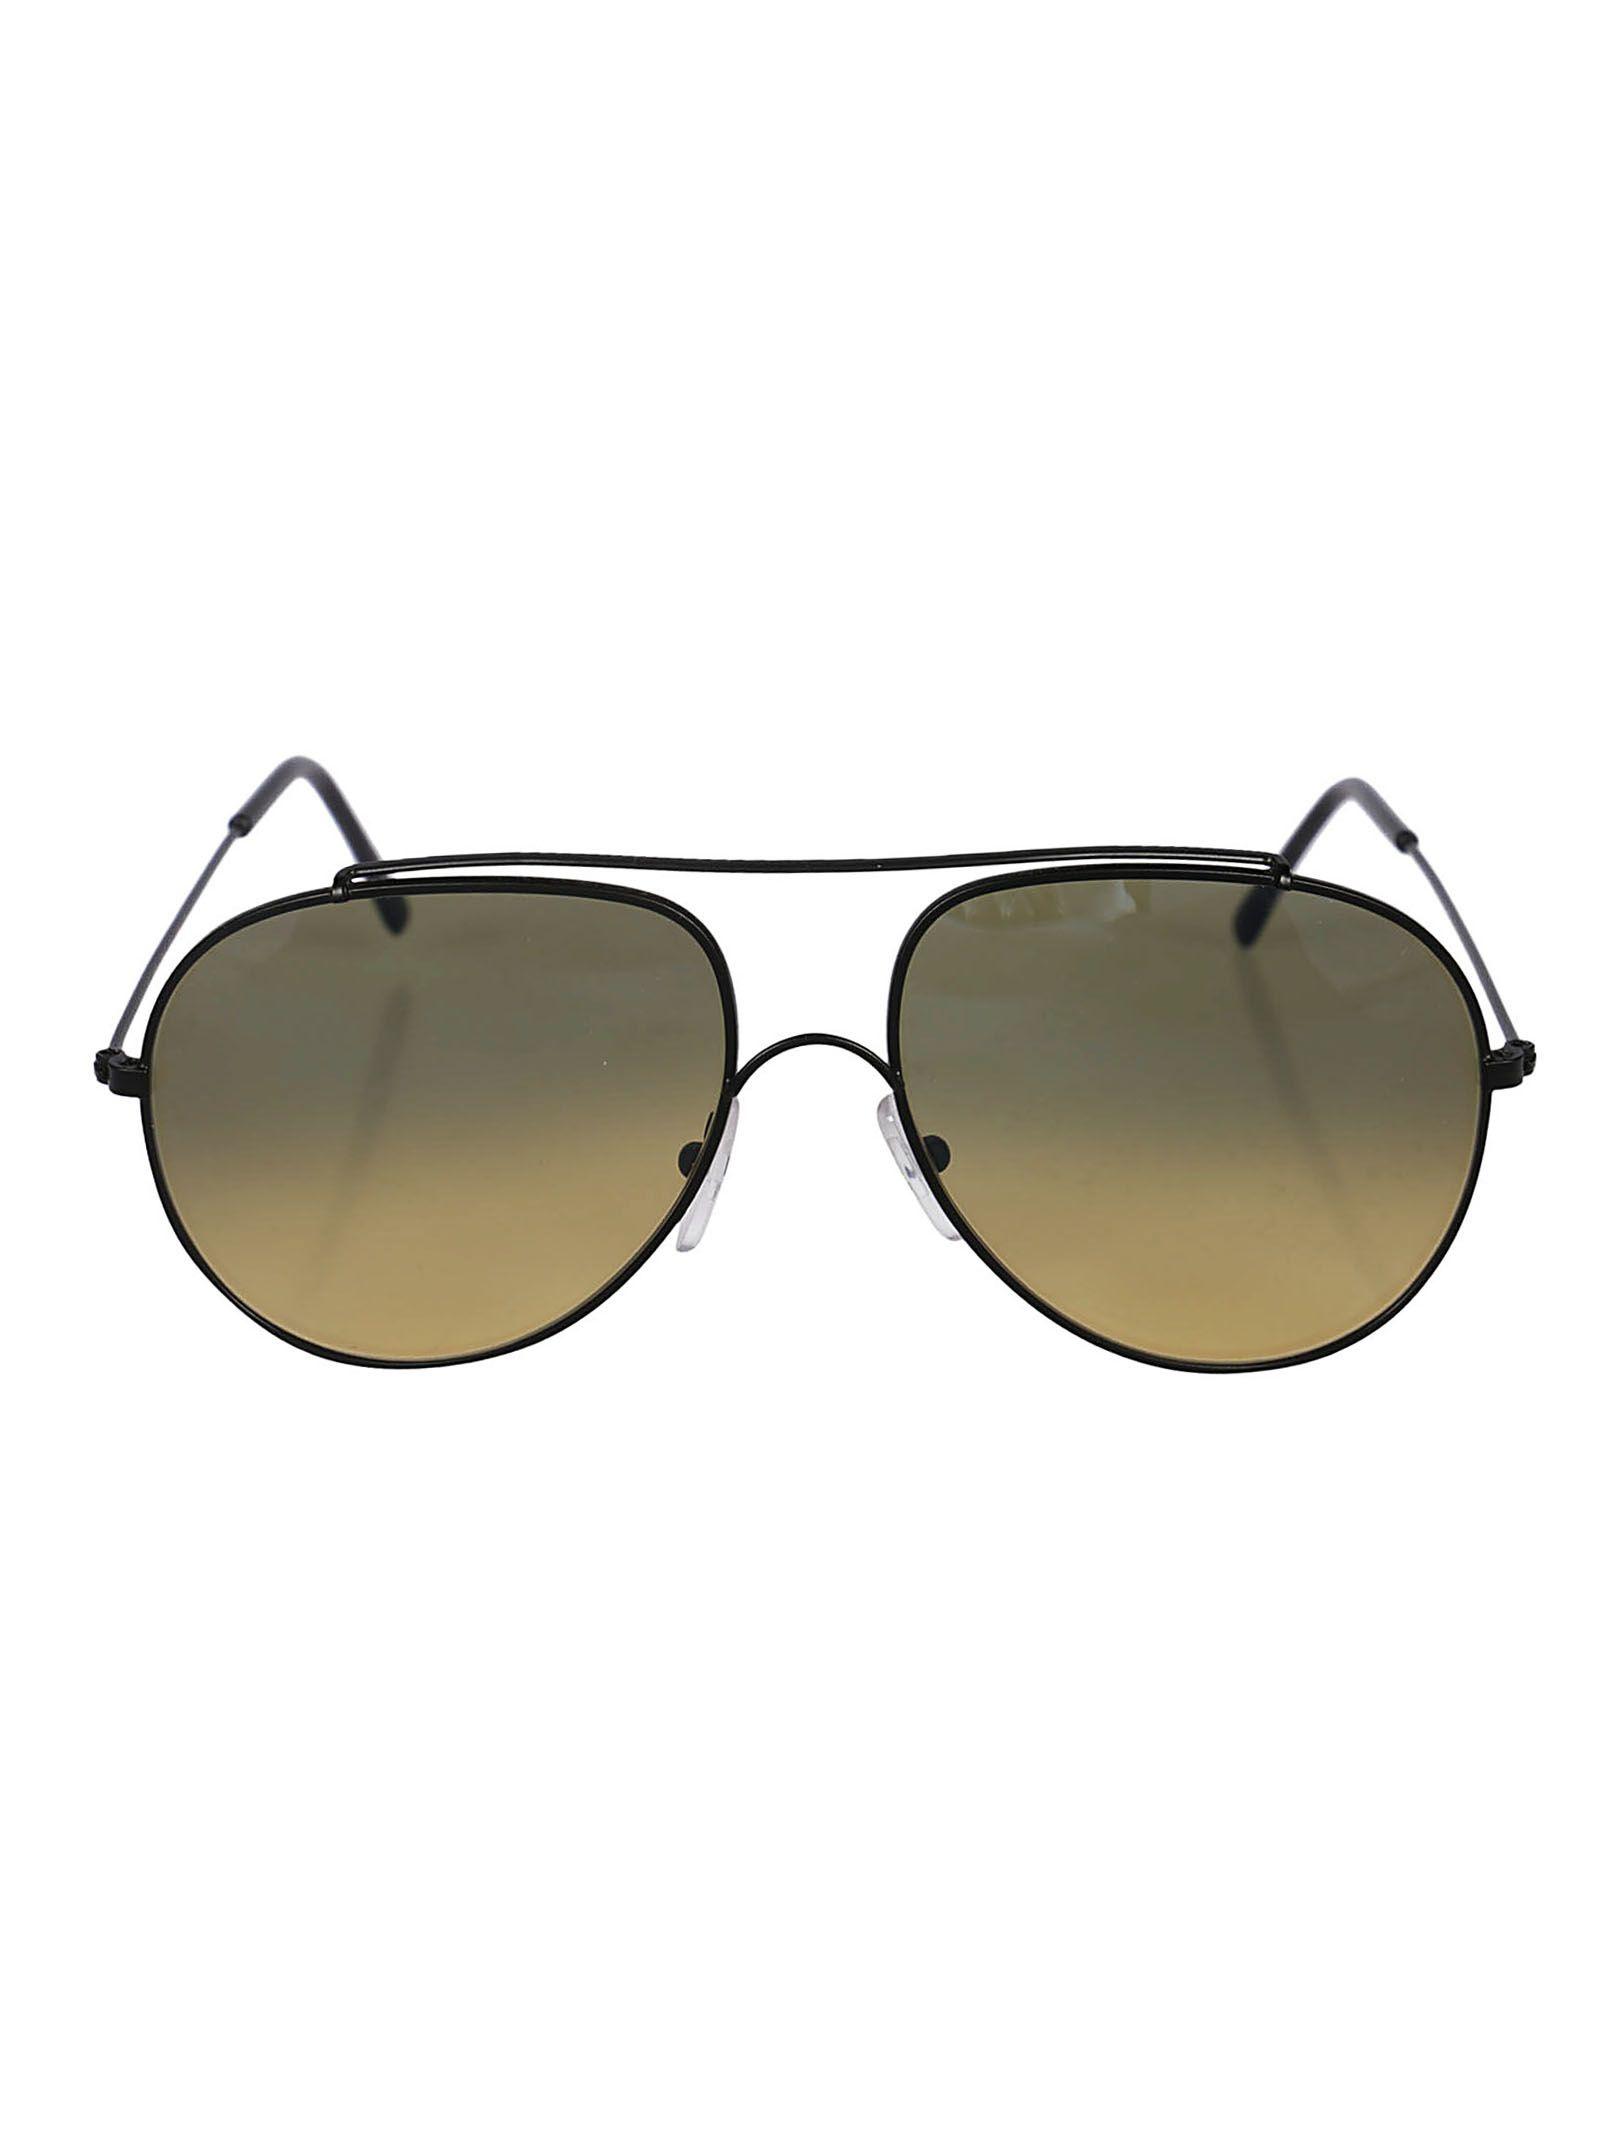 L.G.R Lgr Kilimanjaro Sunglasses in Black Matte